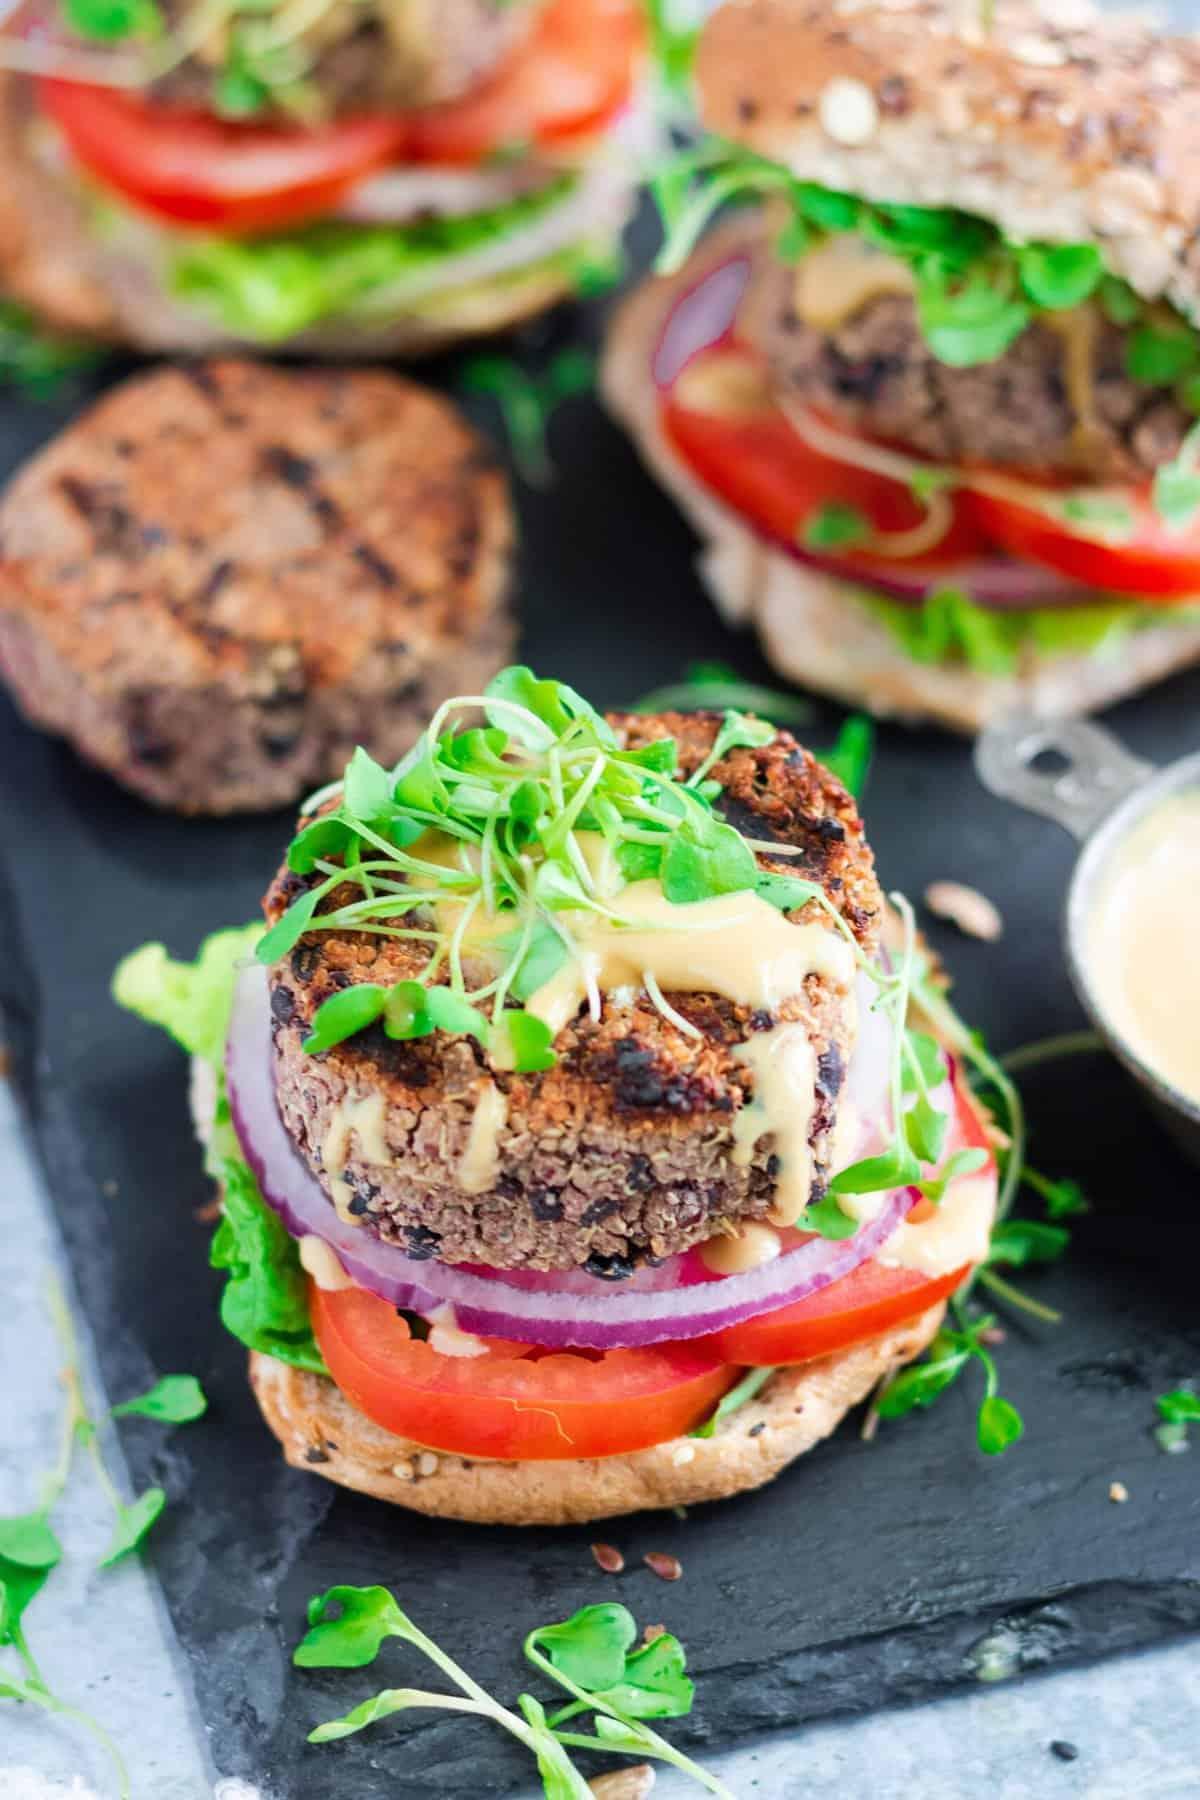 The Best Grillable Veggie Burger Recipe